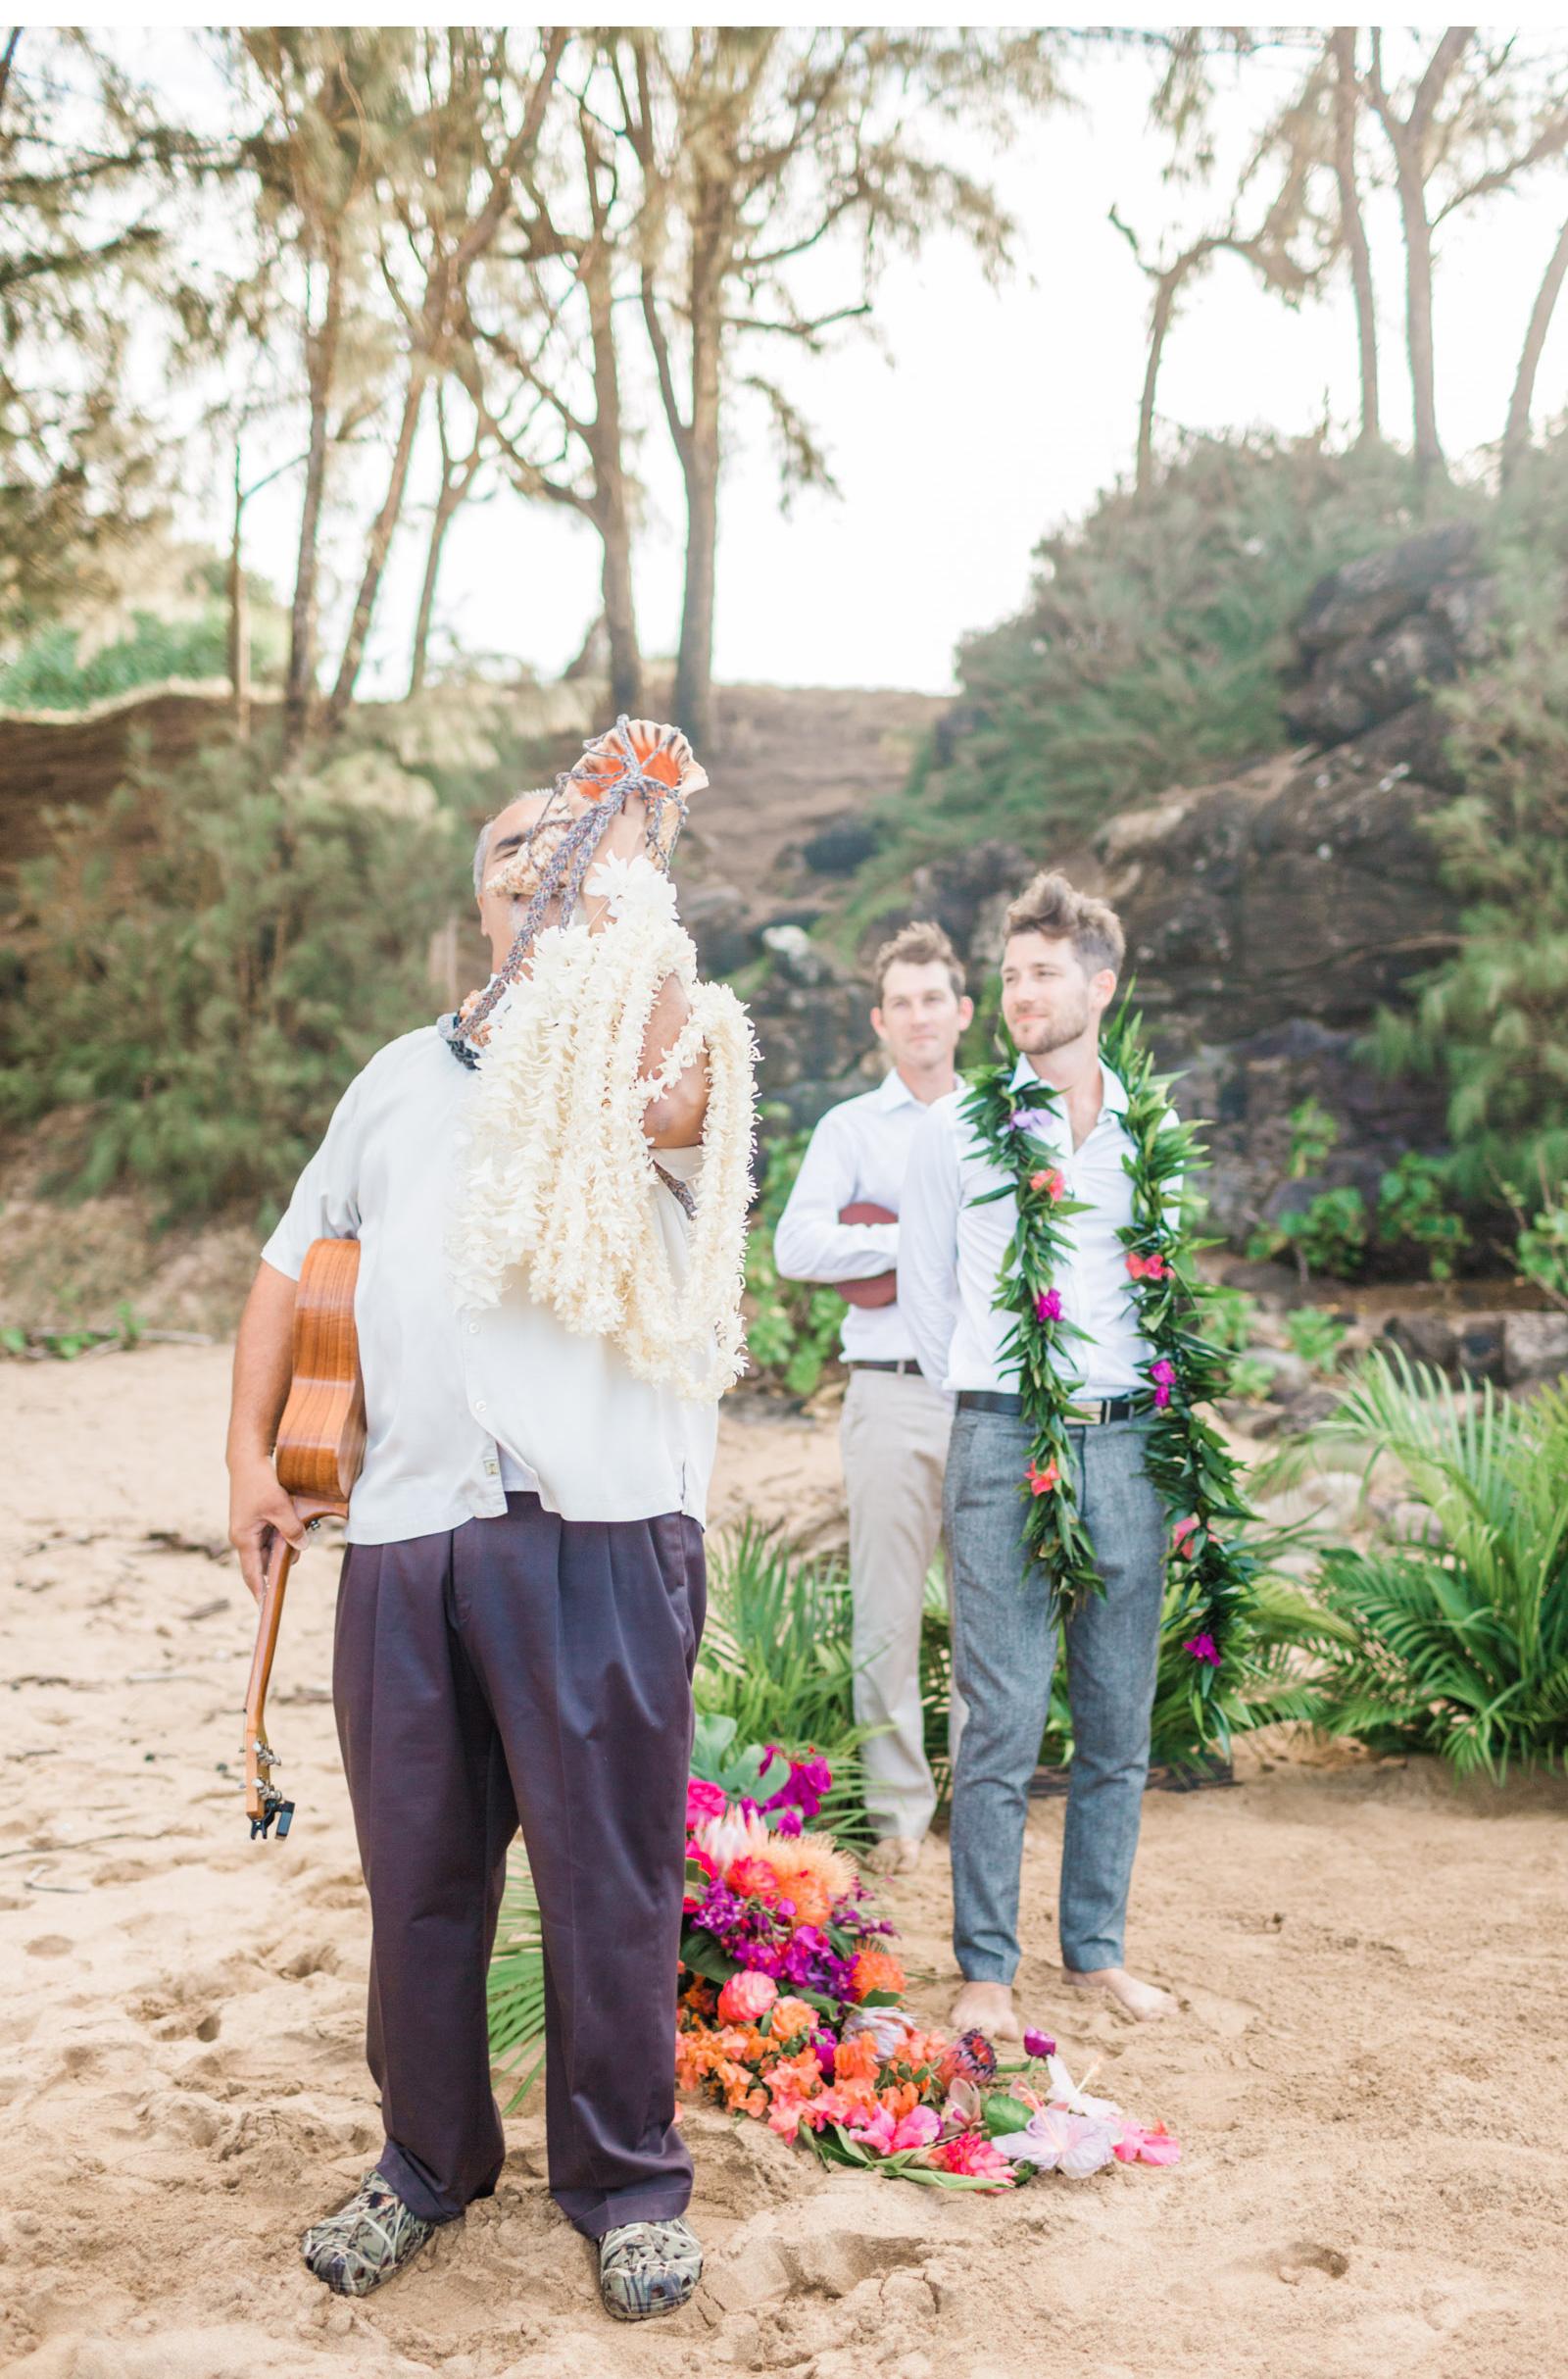 Natalie-Schutt-Photography--Orange-County-Wedding-Photographer_02.jpg